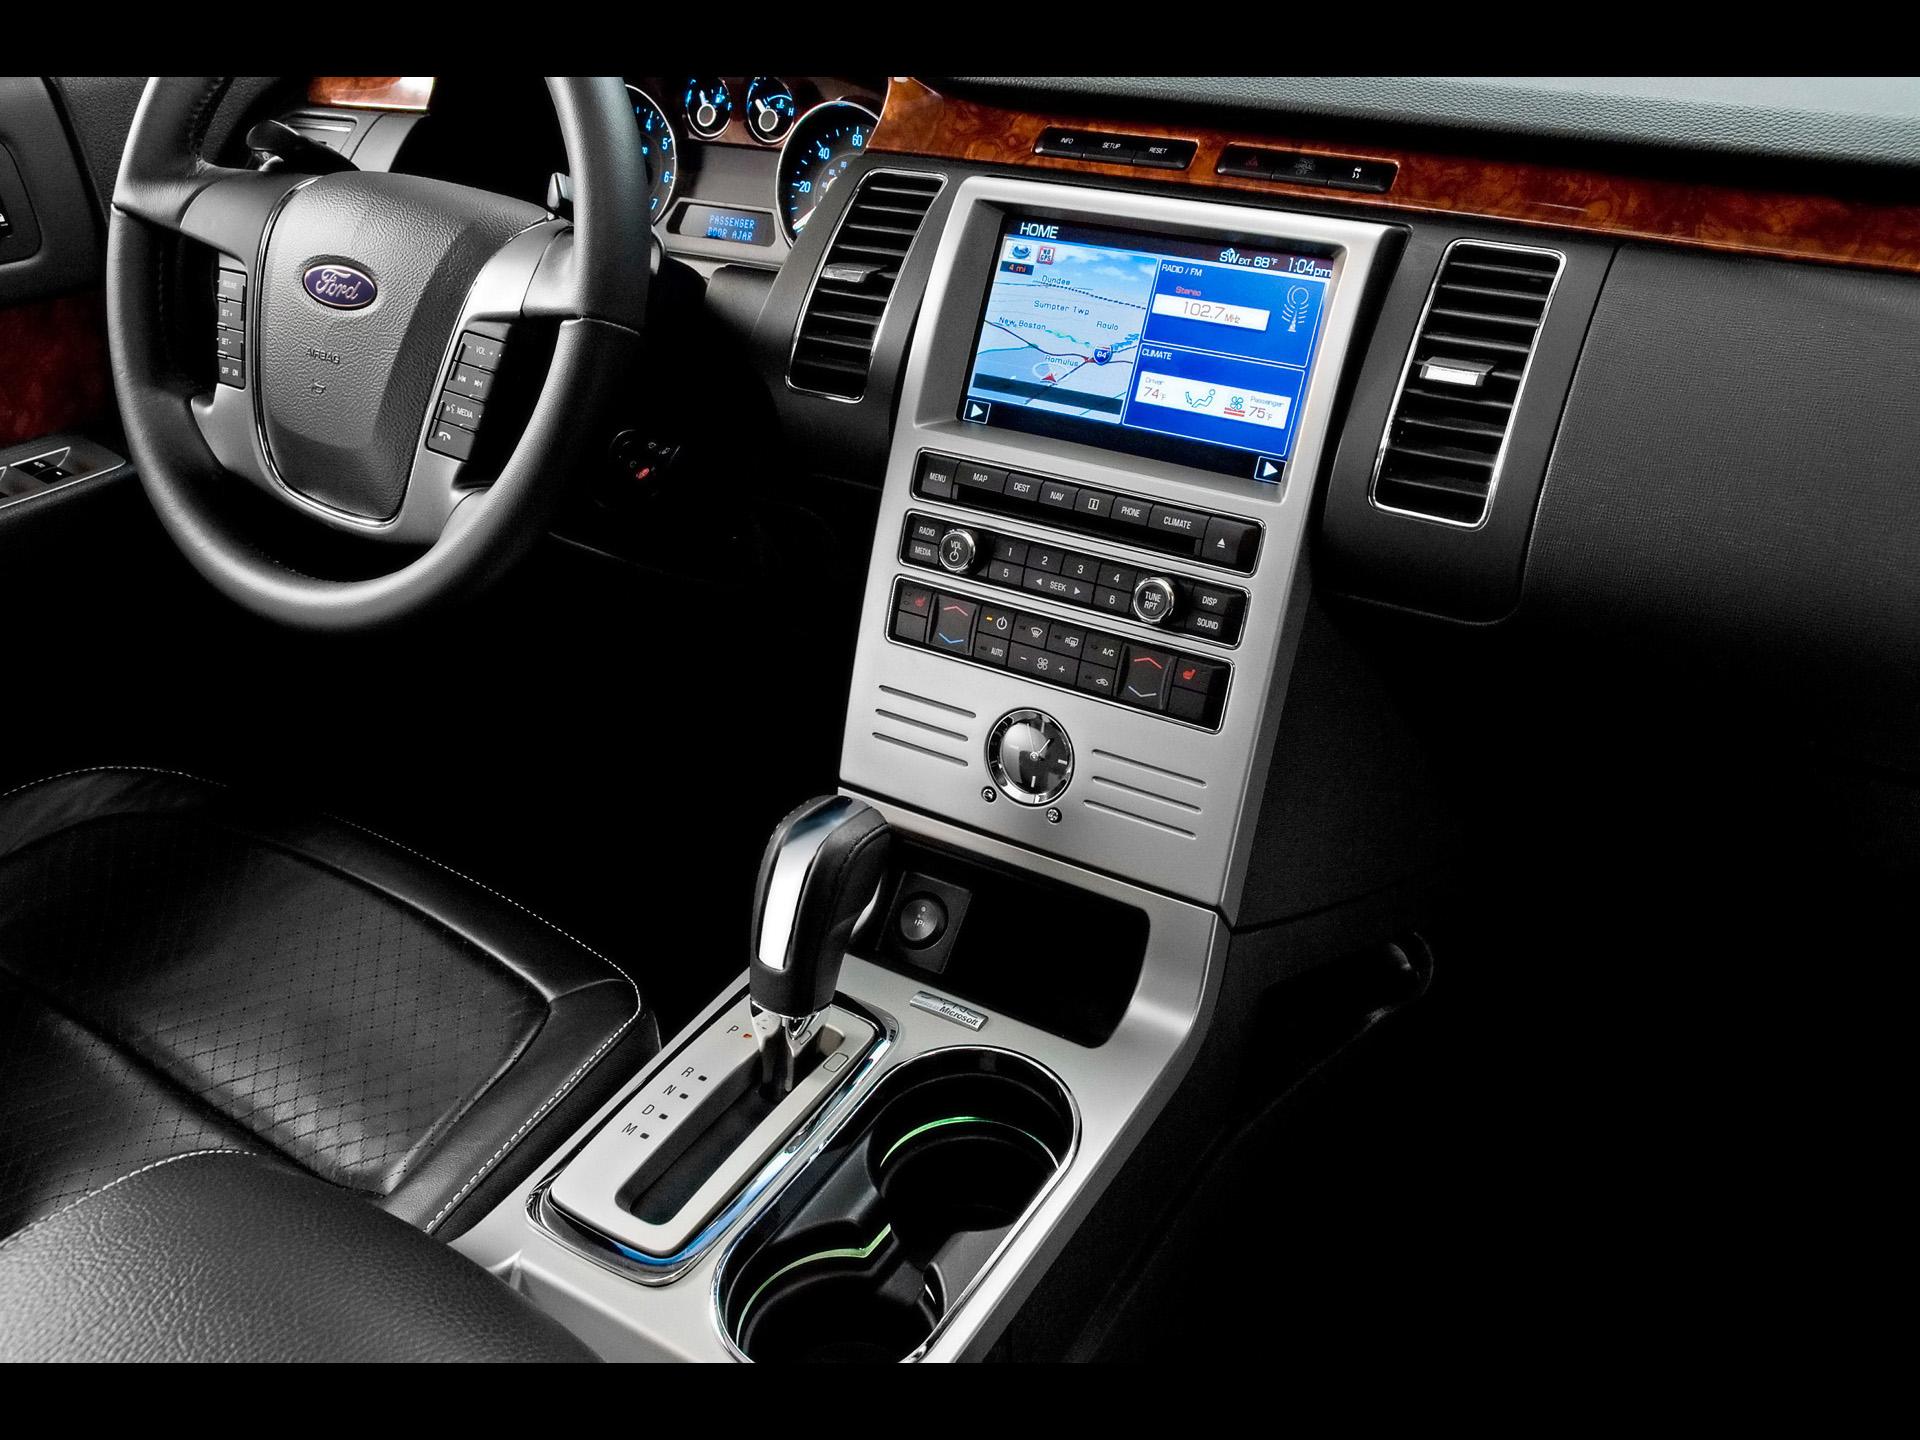 2010 Ford Flex Image 18